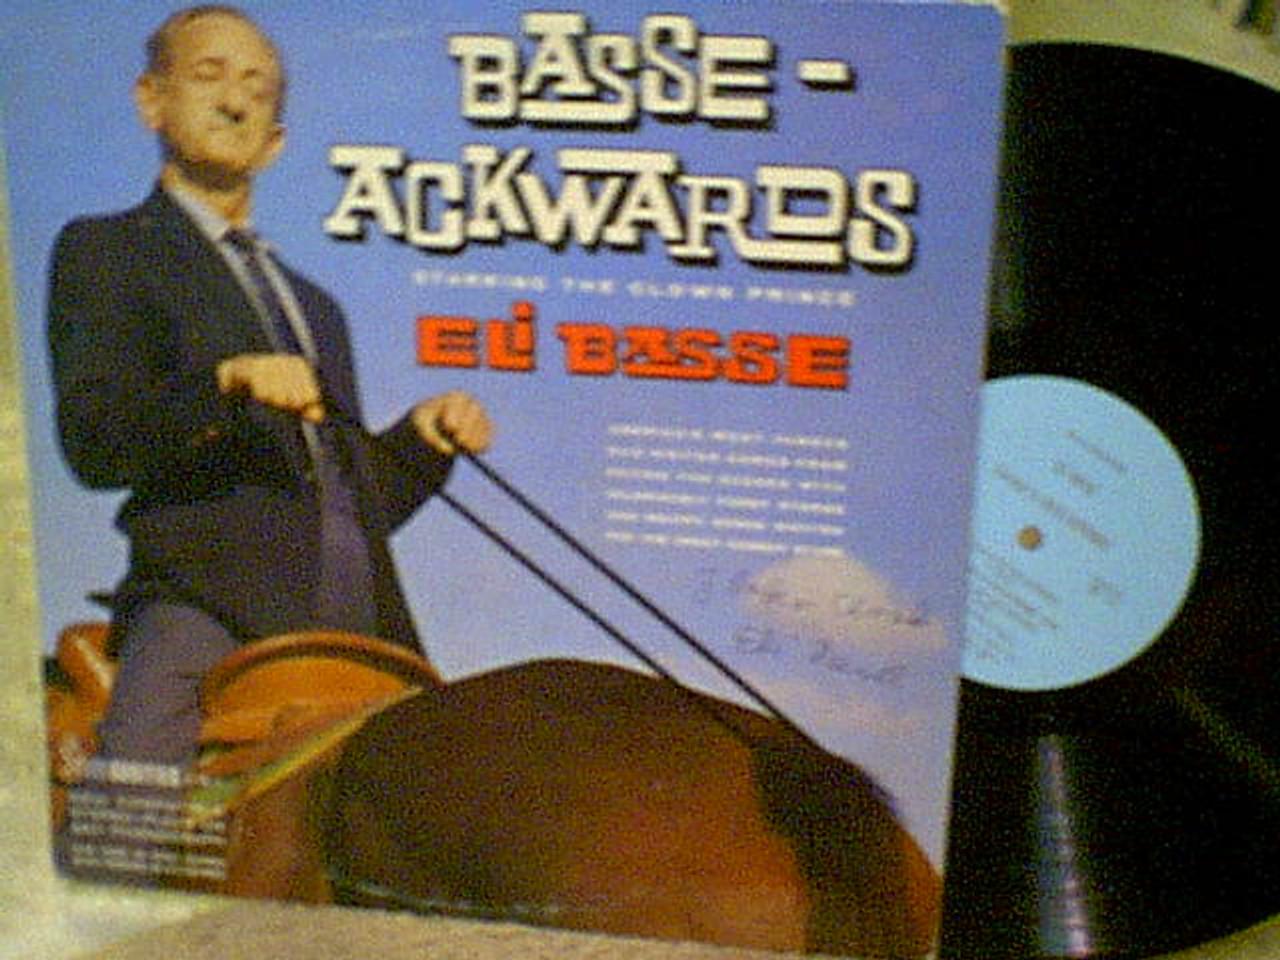 Basse, Eli LP Signed Autograph Basse Ackwards